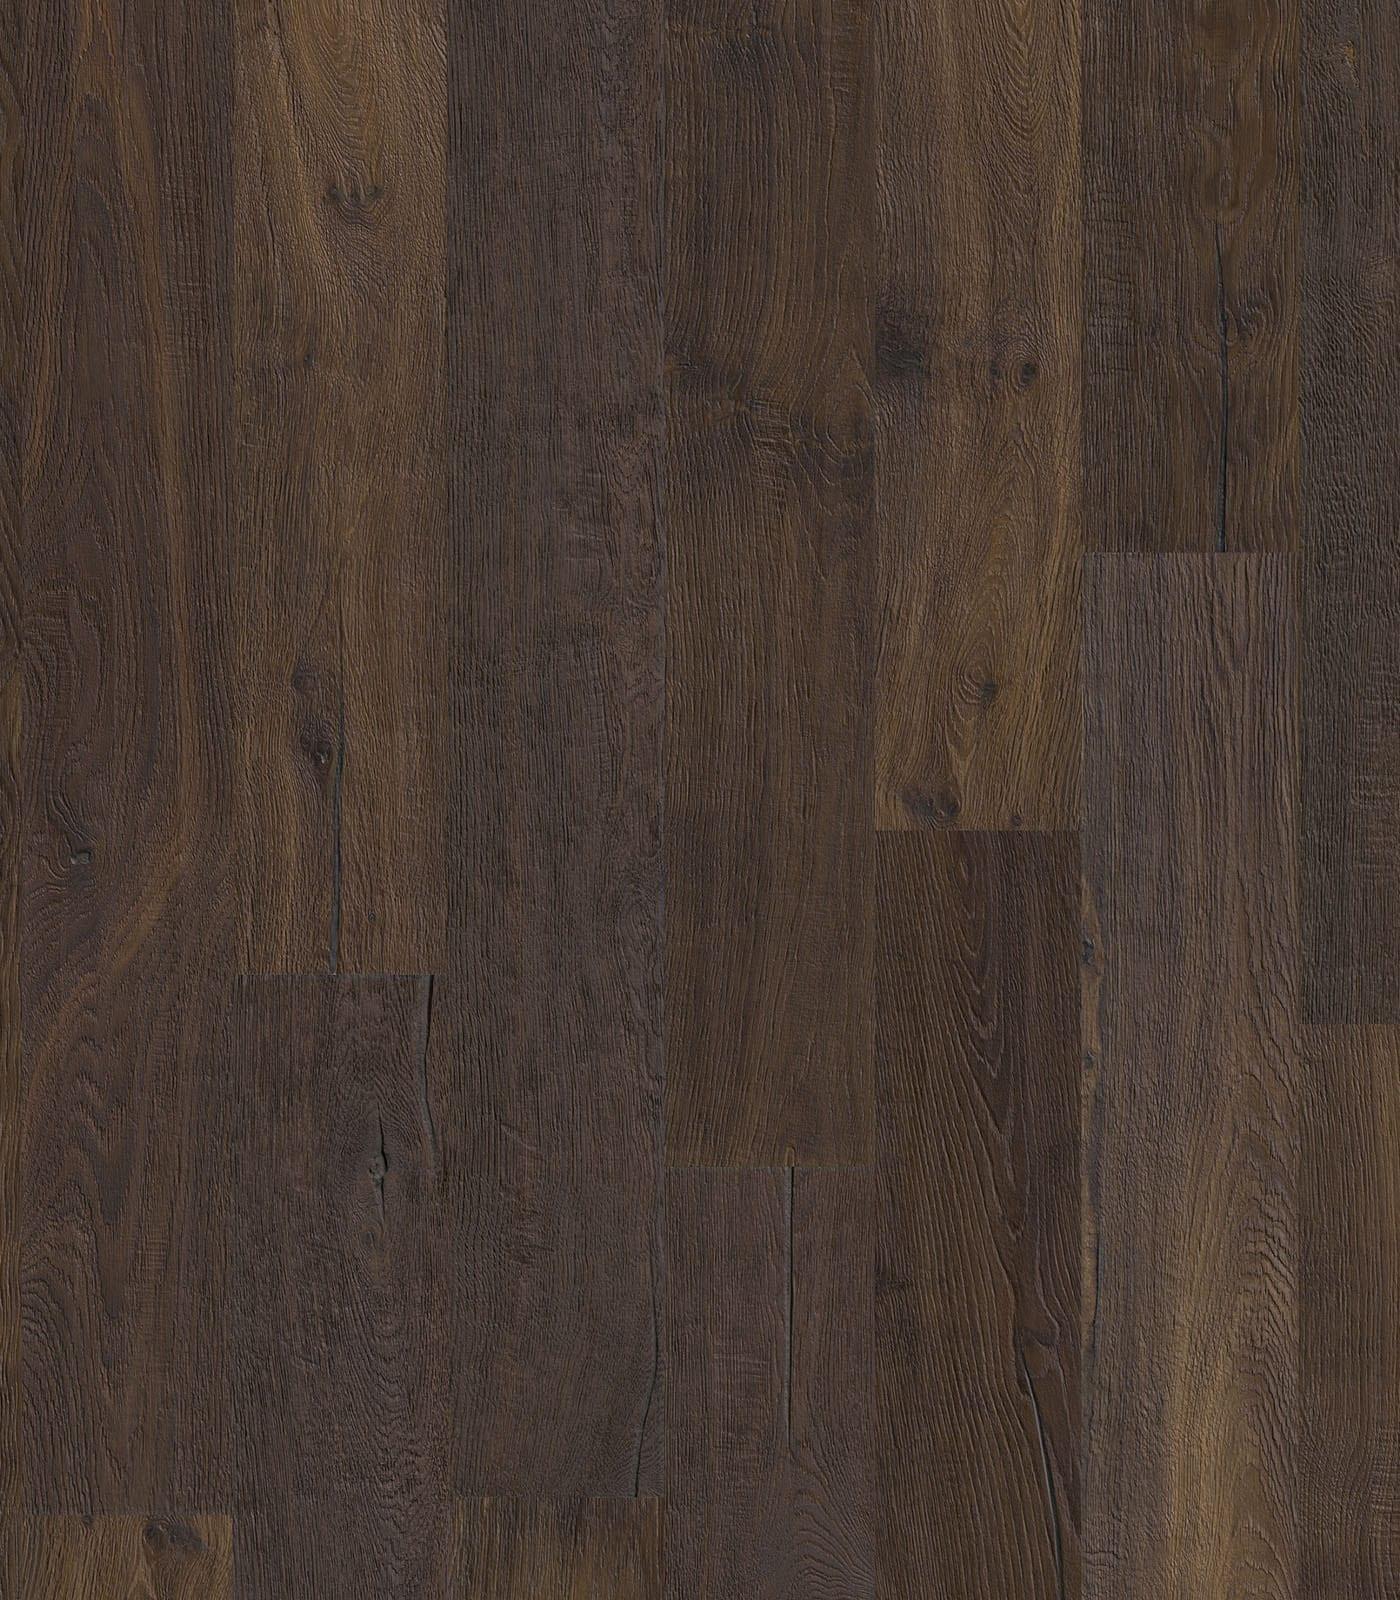 Pamirs-Antique collection-European oak flooring-flat